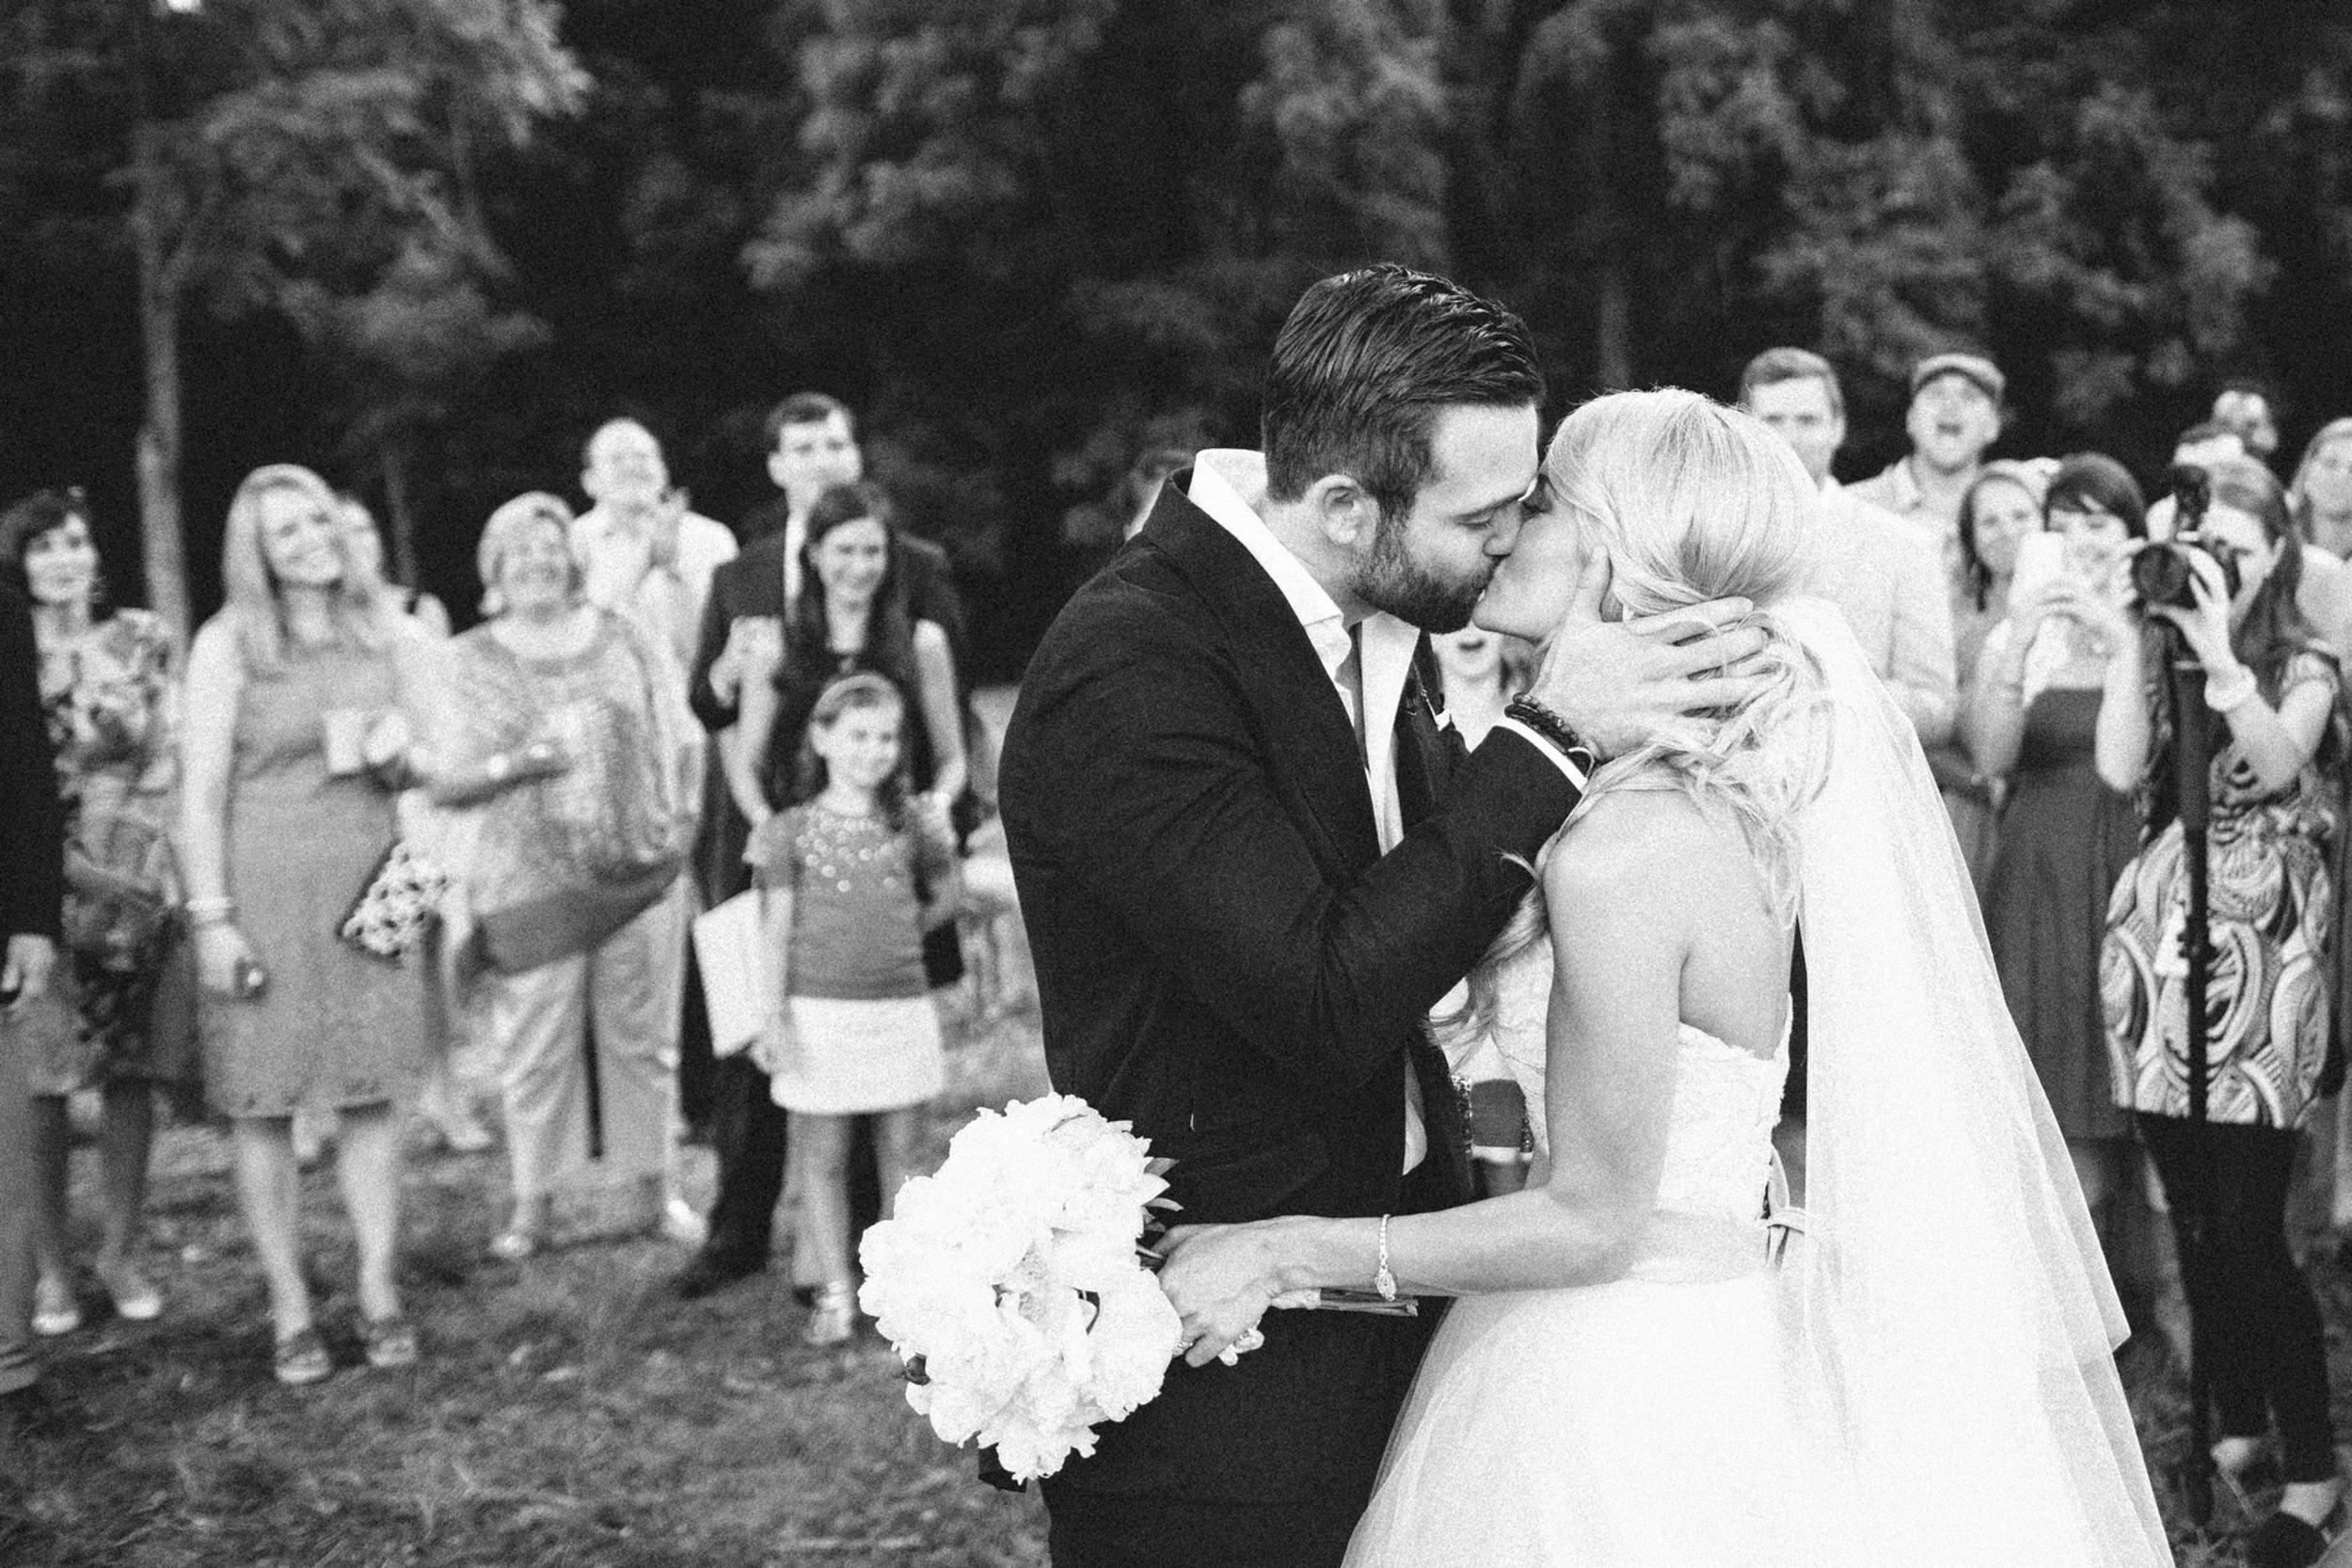 south_carolina_farm_wedding_rustic_chic_surprise_secret_luxe_wedding_bachelorette_emily_maynard_real_weddings-60.jpg